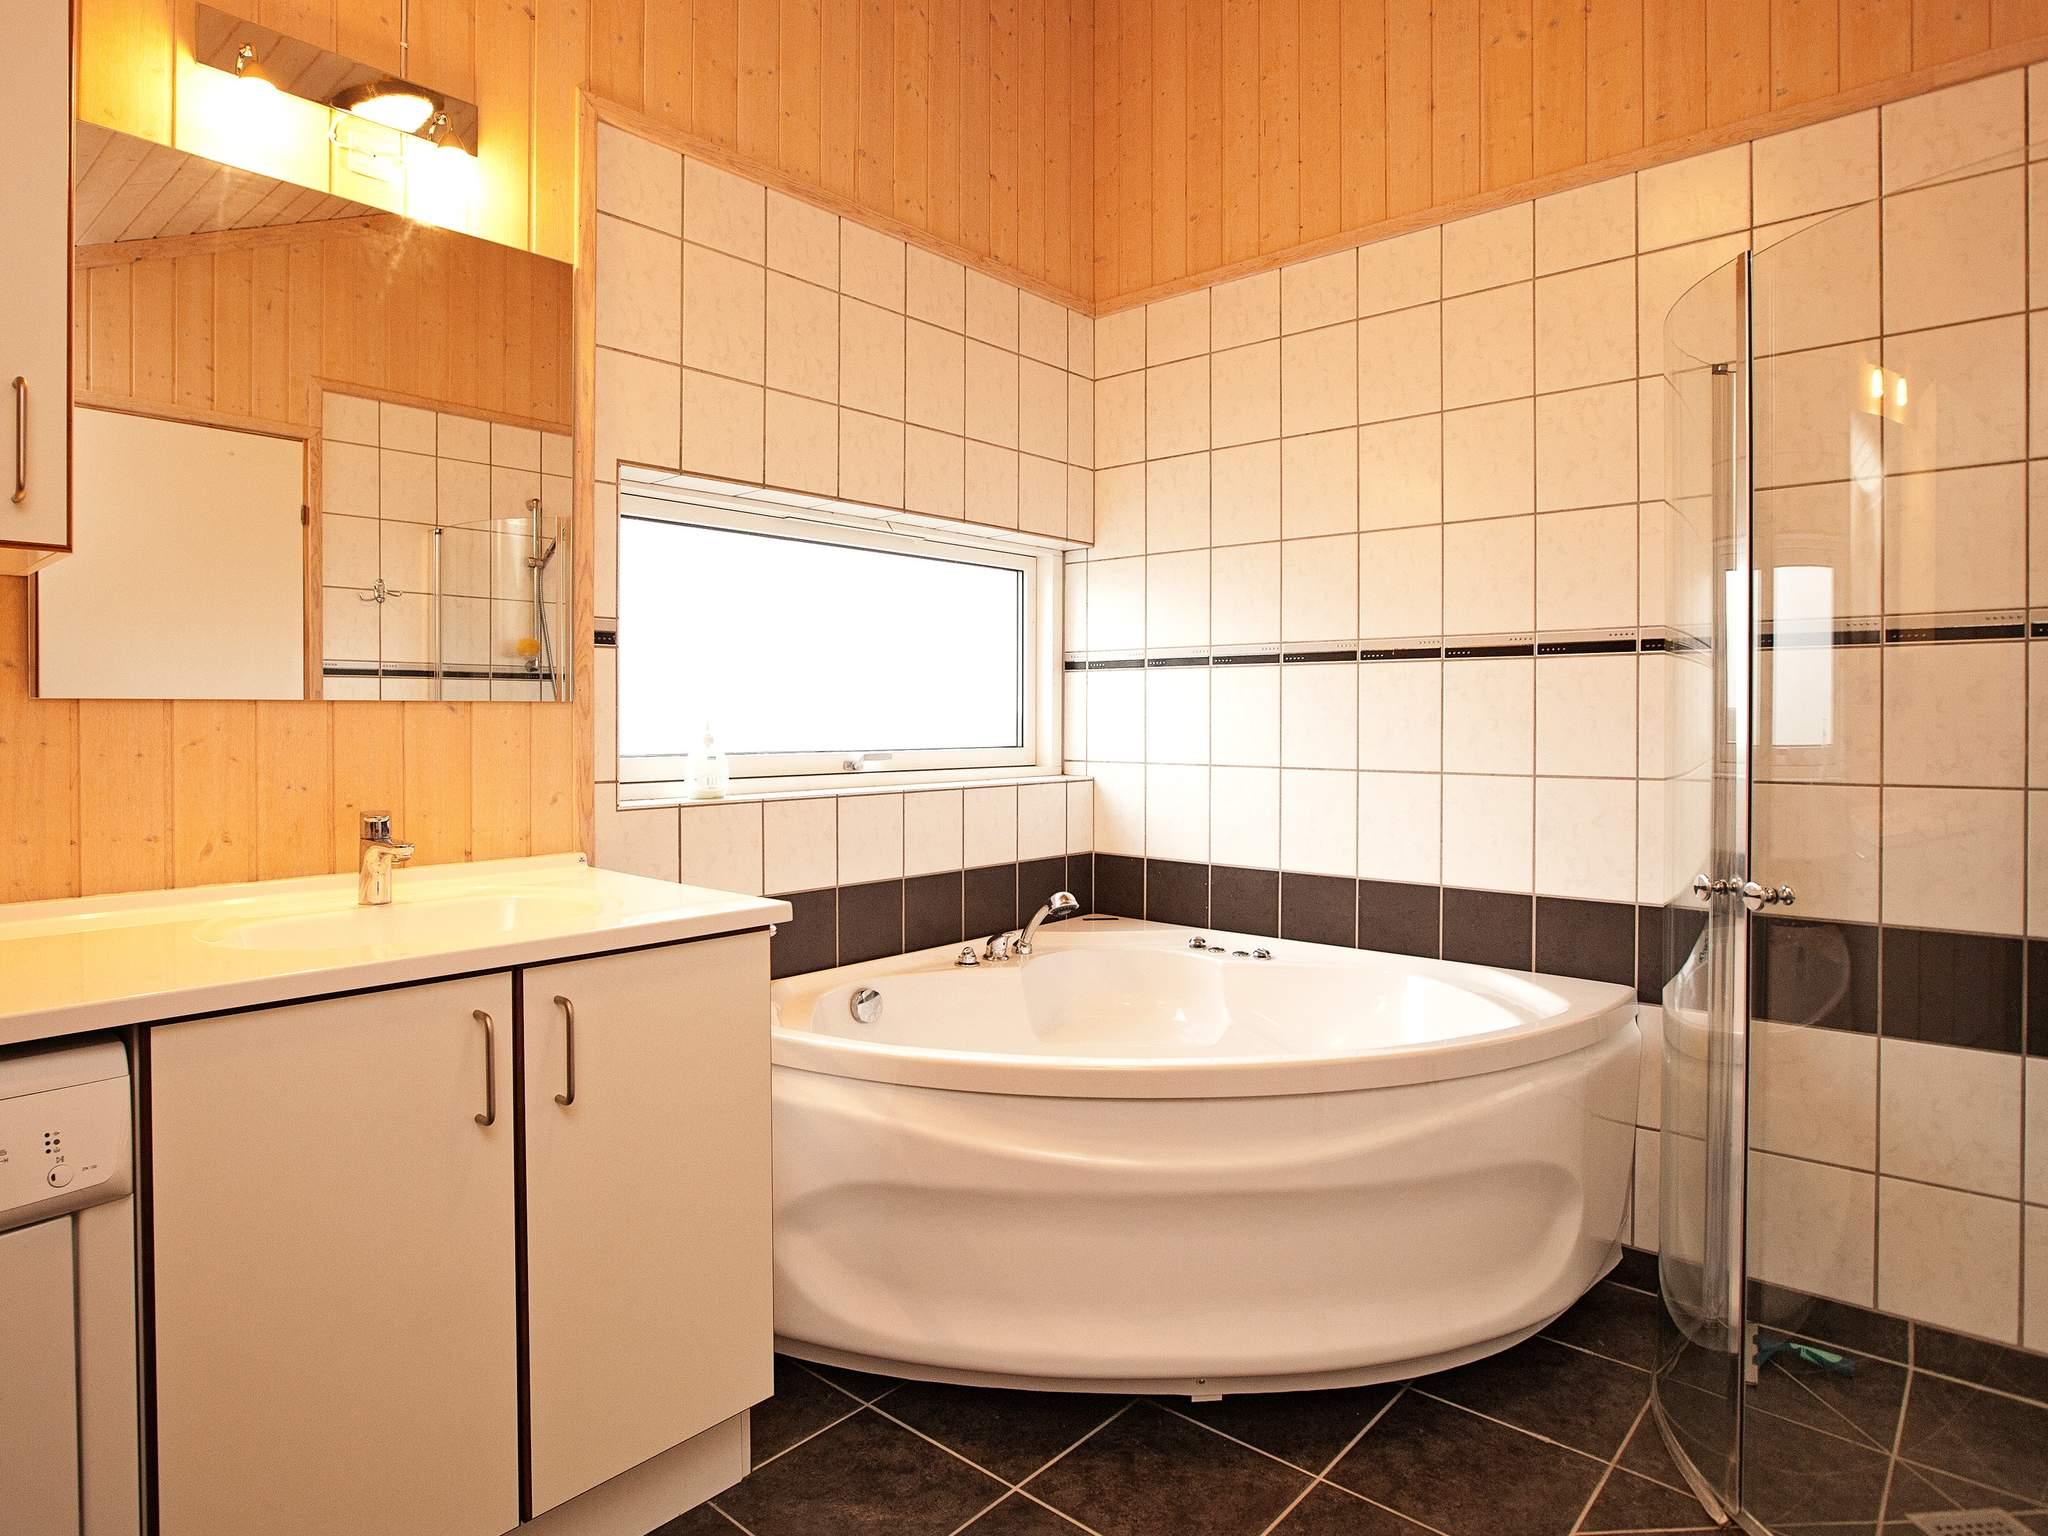 Maison de vacances Bredfjed (470640), Bredfjed, , Lolland, Danemark, image 17